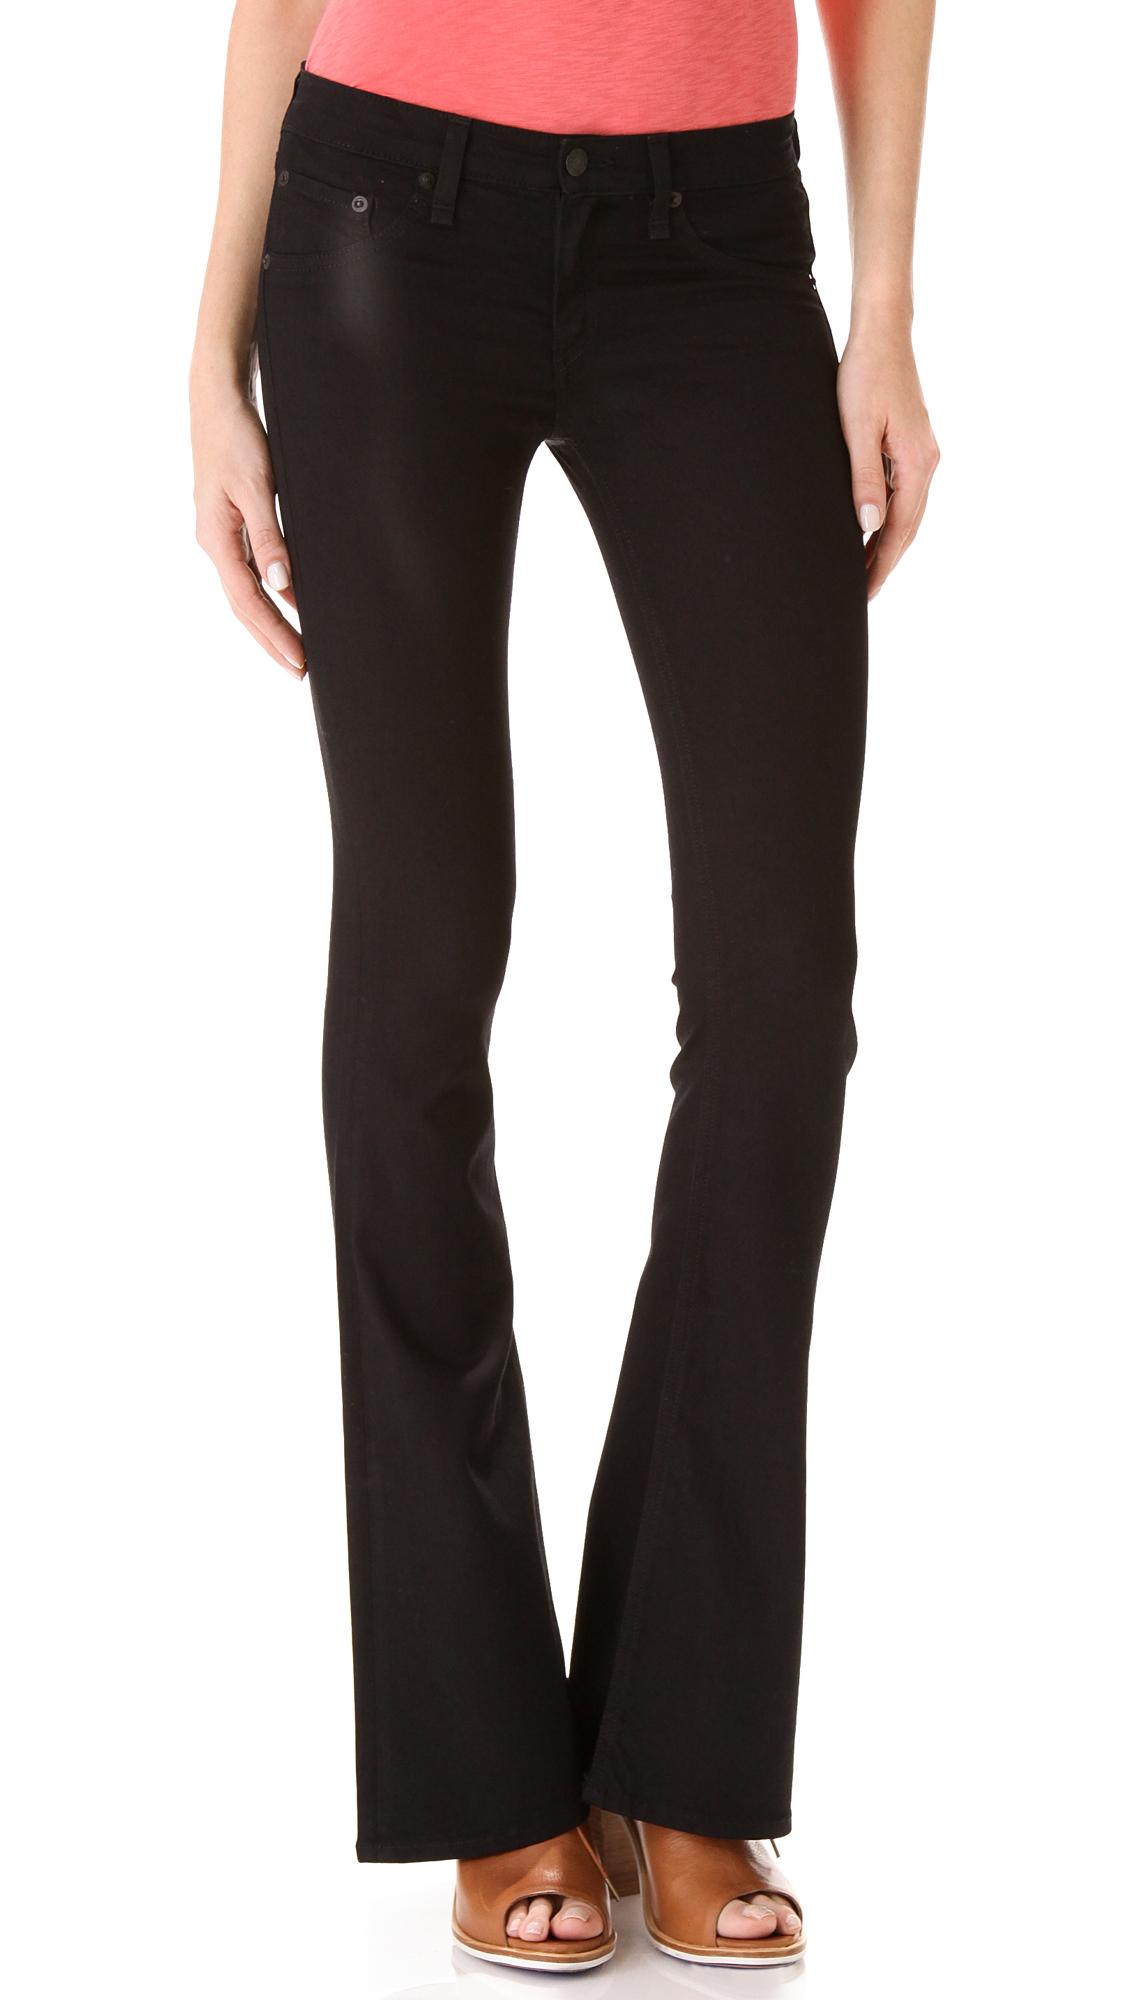 Womens Black Ripped Skinny Jeans